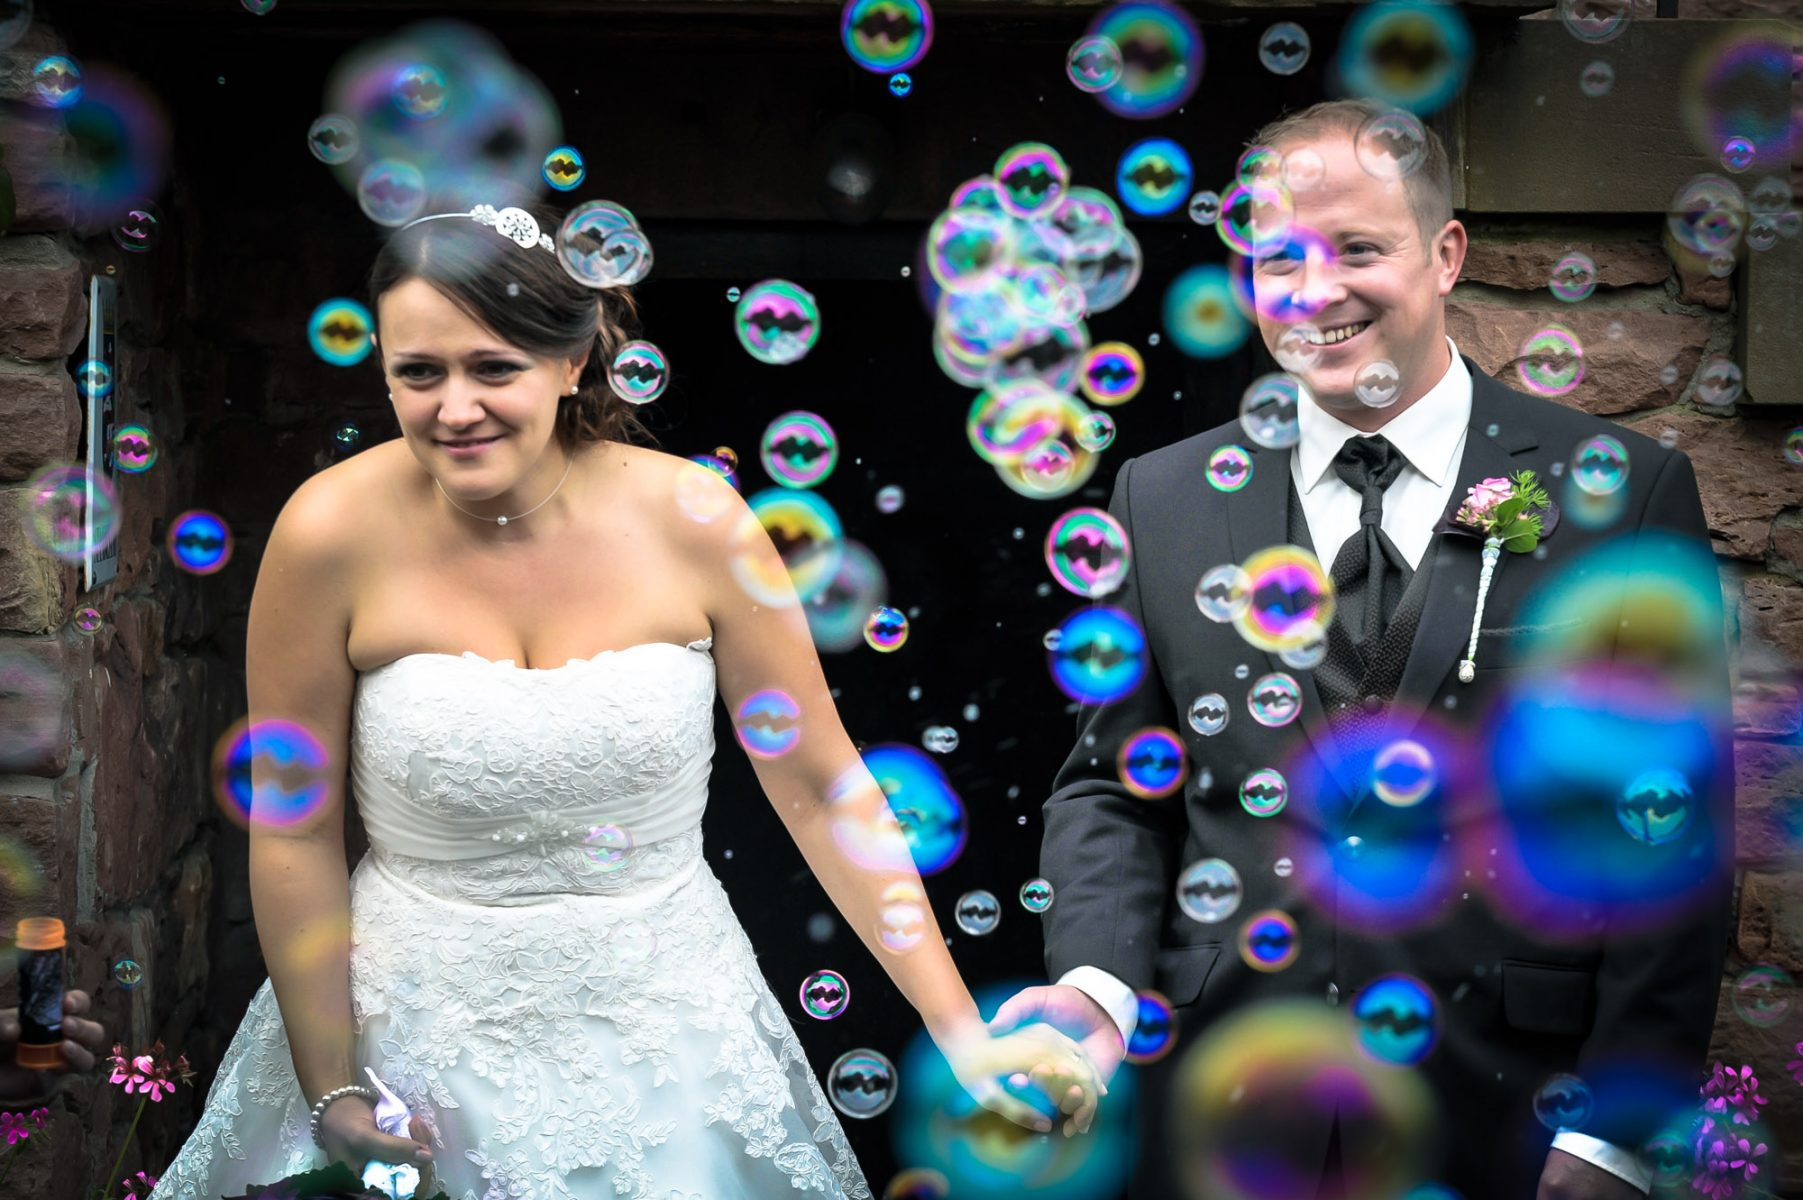 Hochzeit Feier  B2000 222271 1803x1200 - Trauung